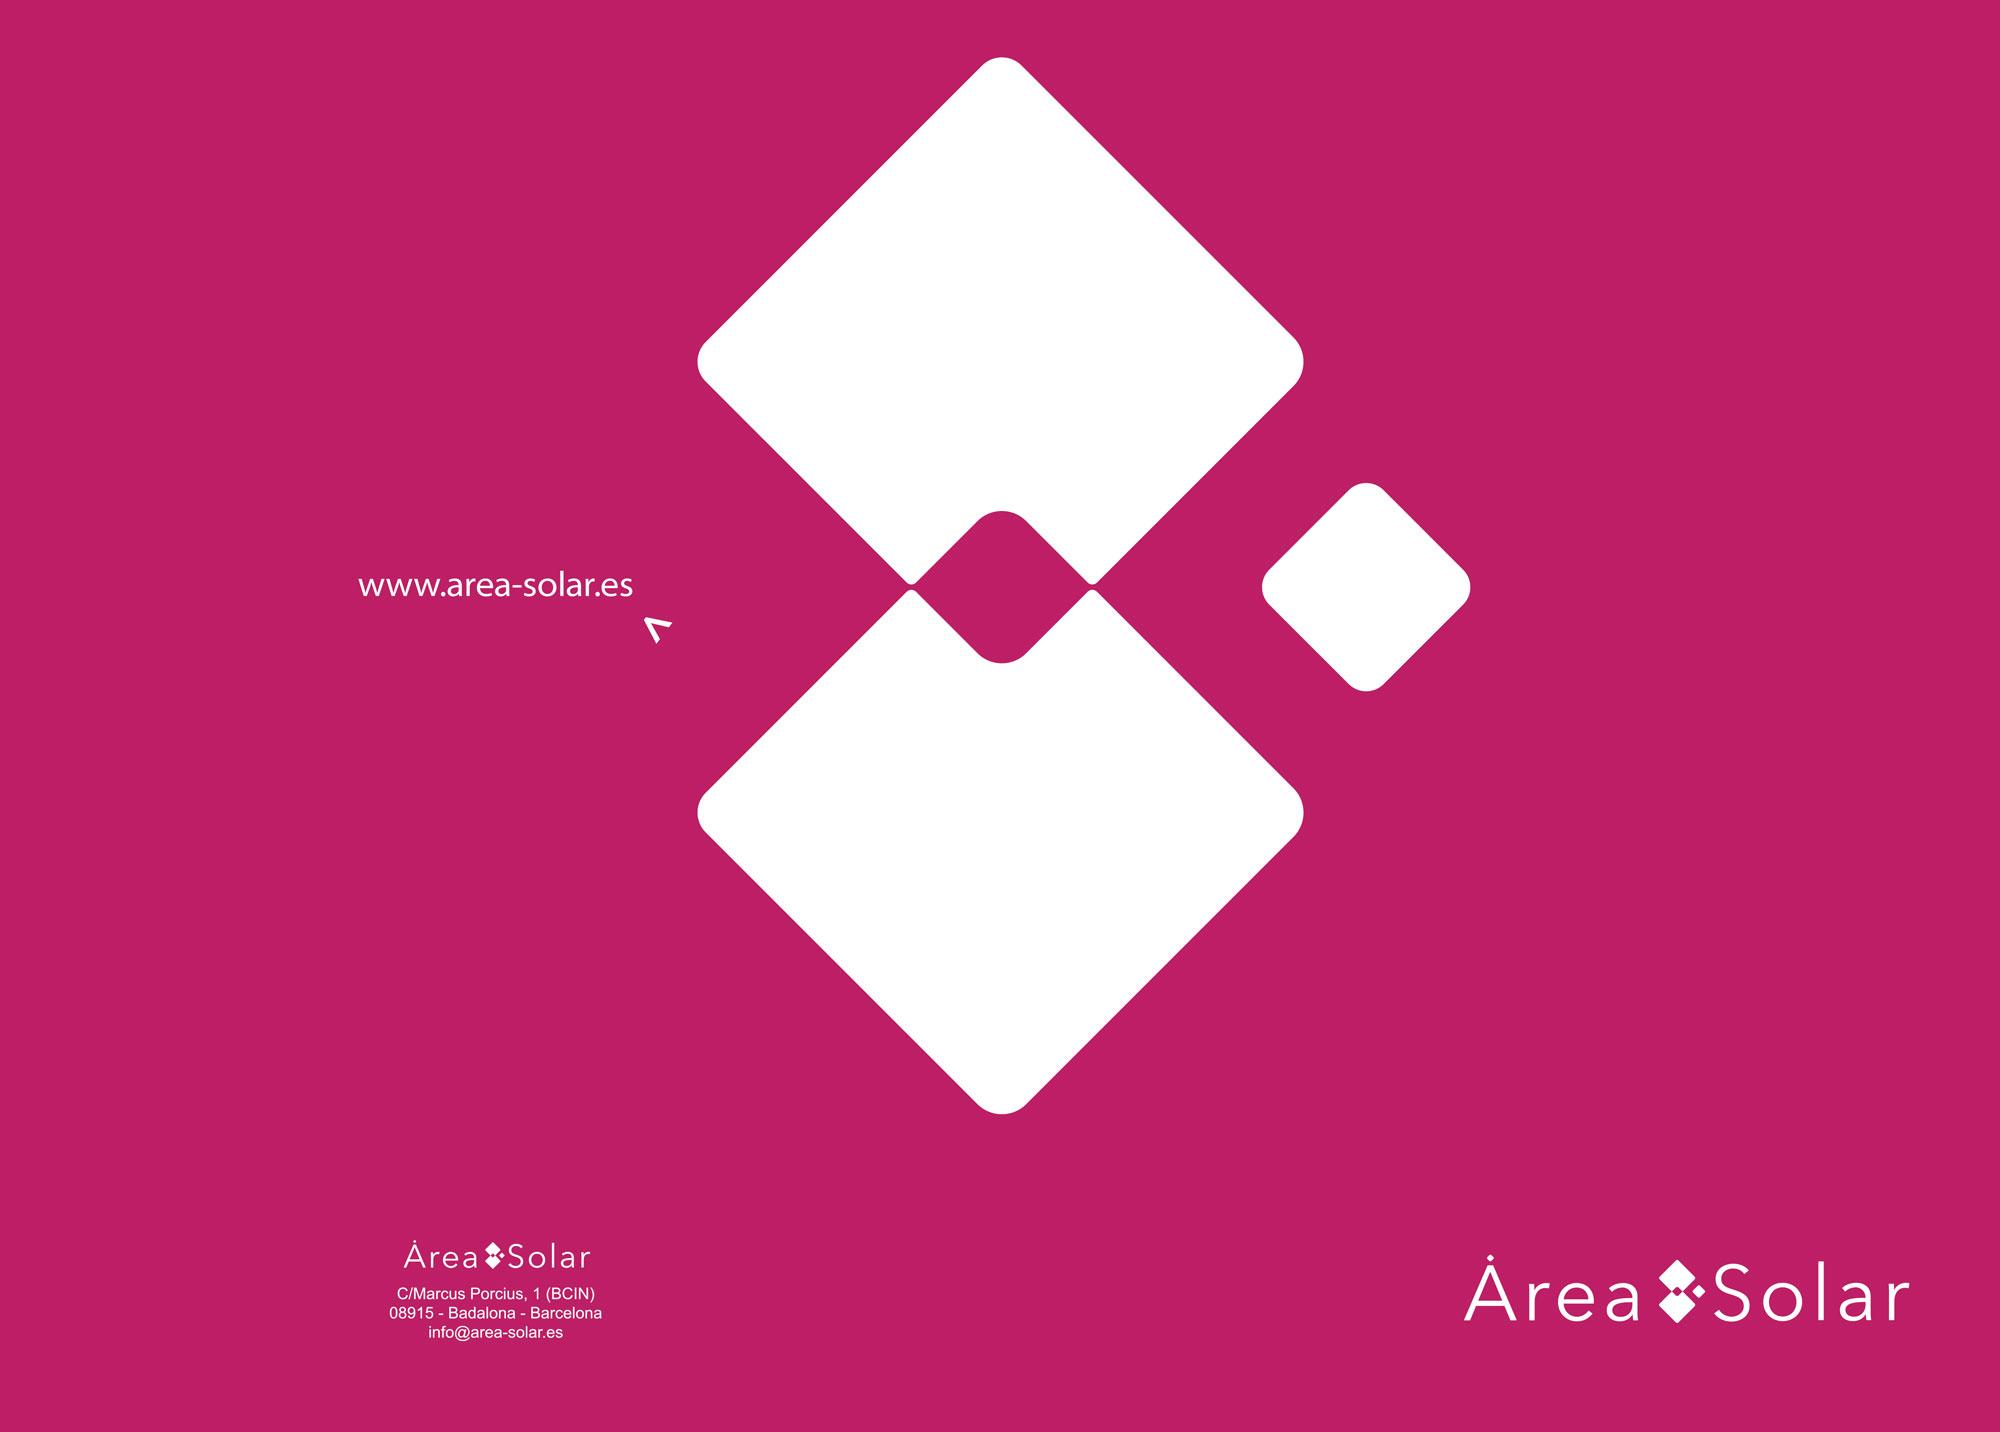 Logotipo Area Solar - Impresión Badalona